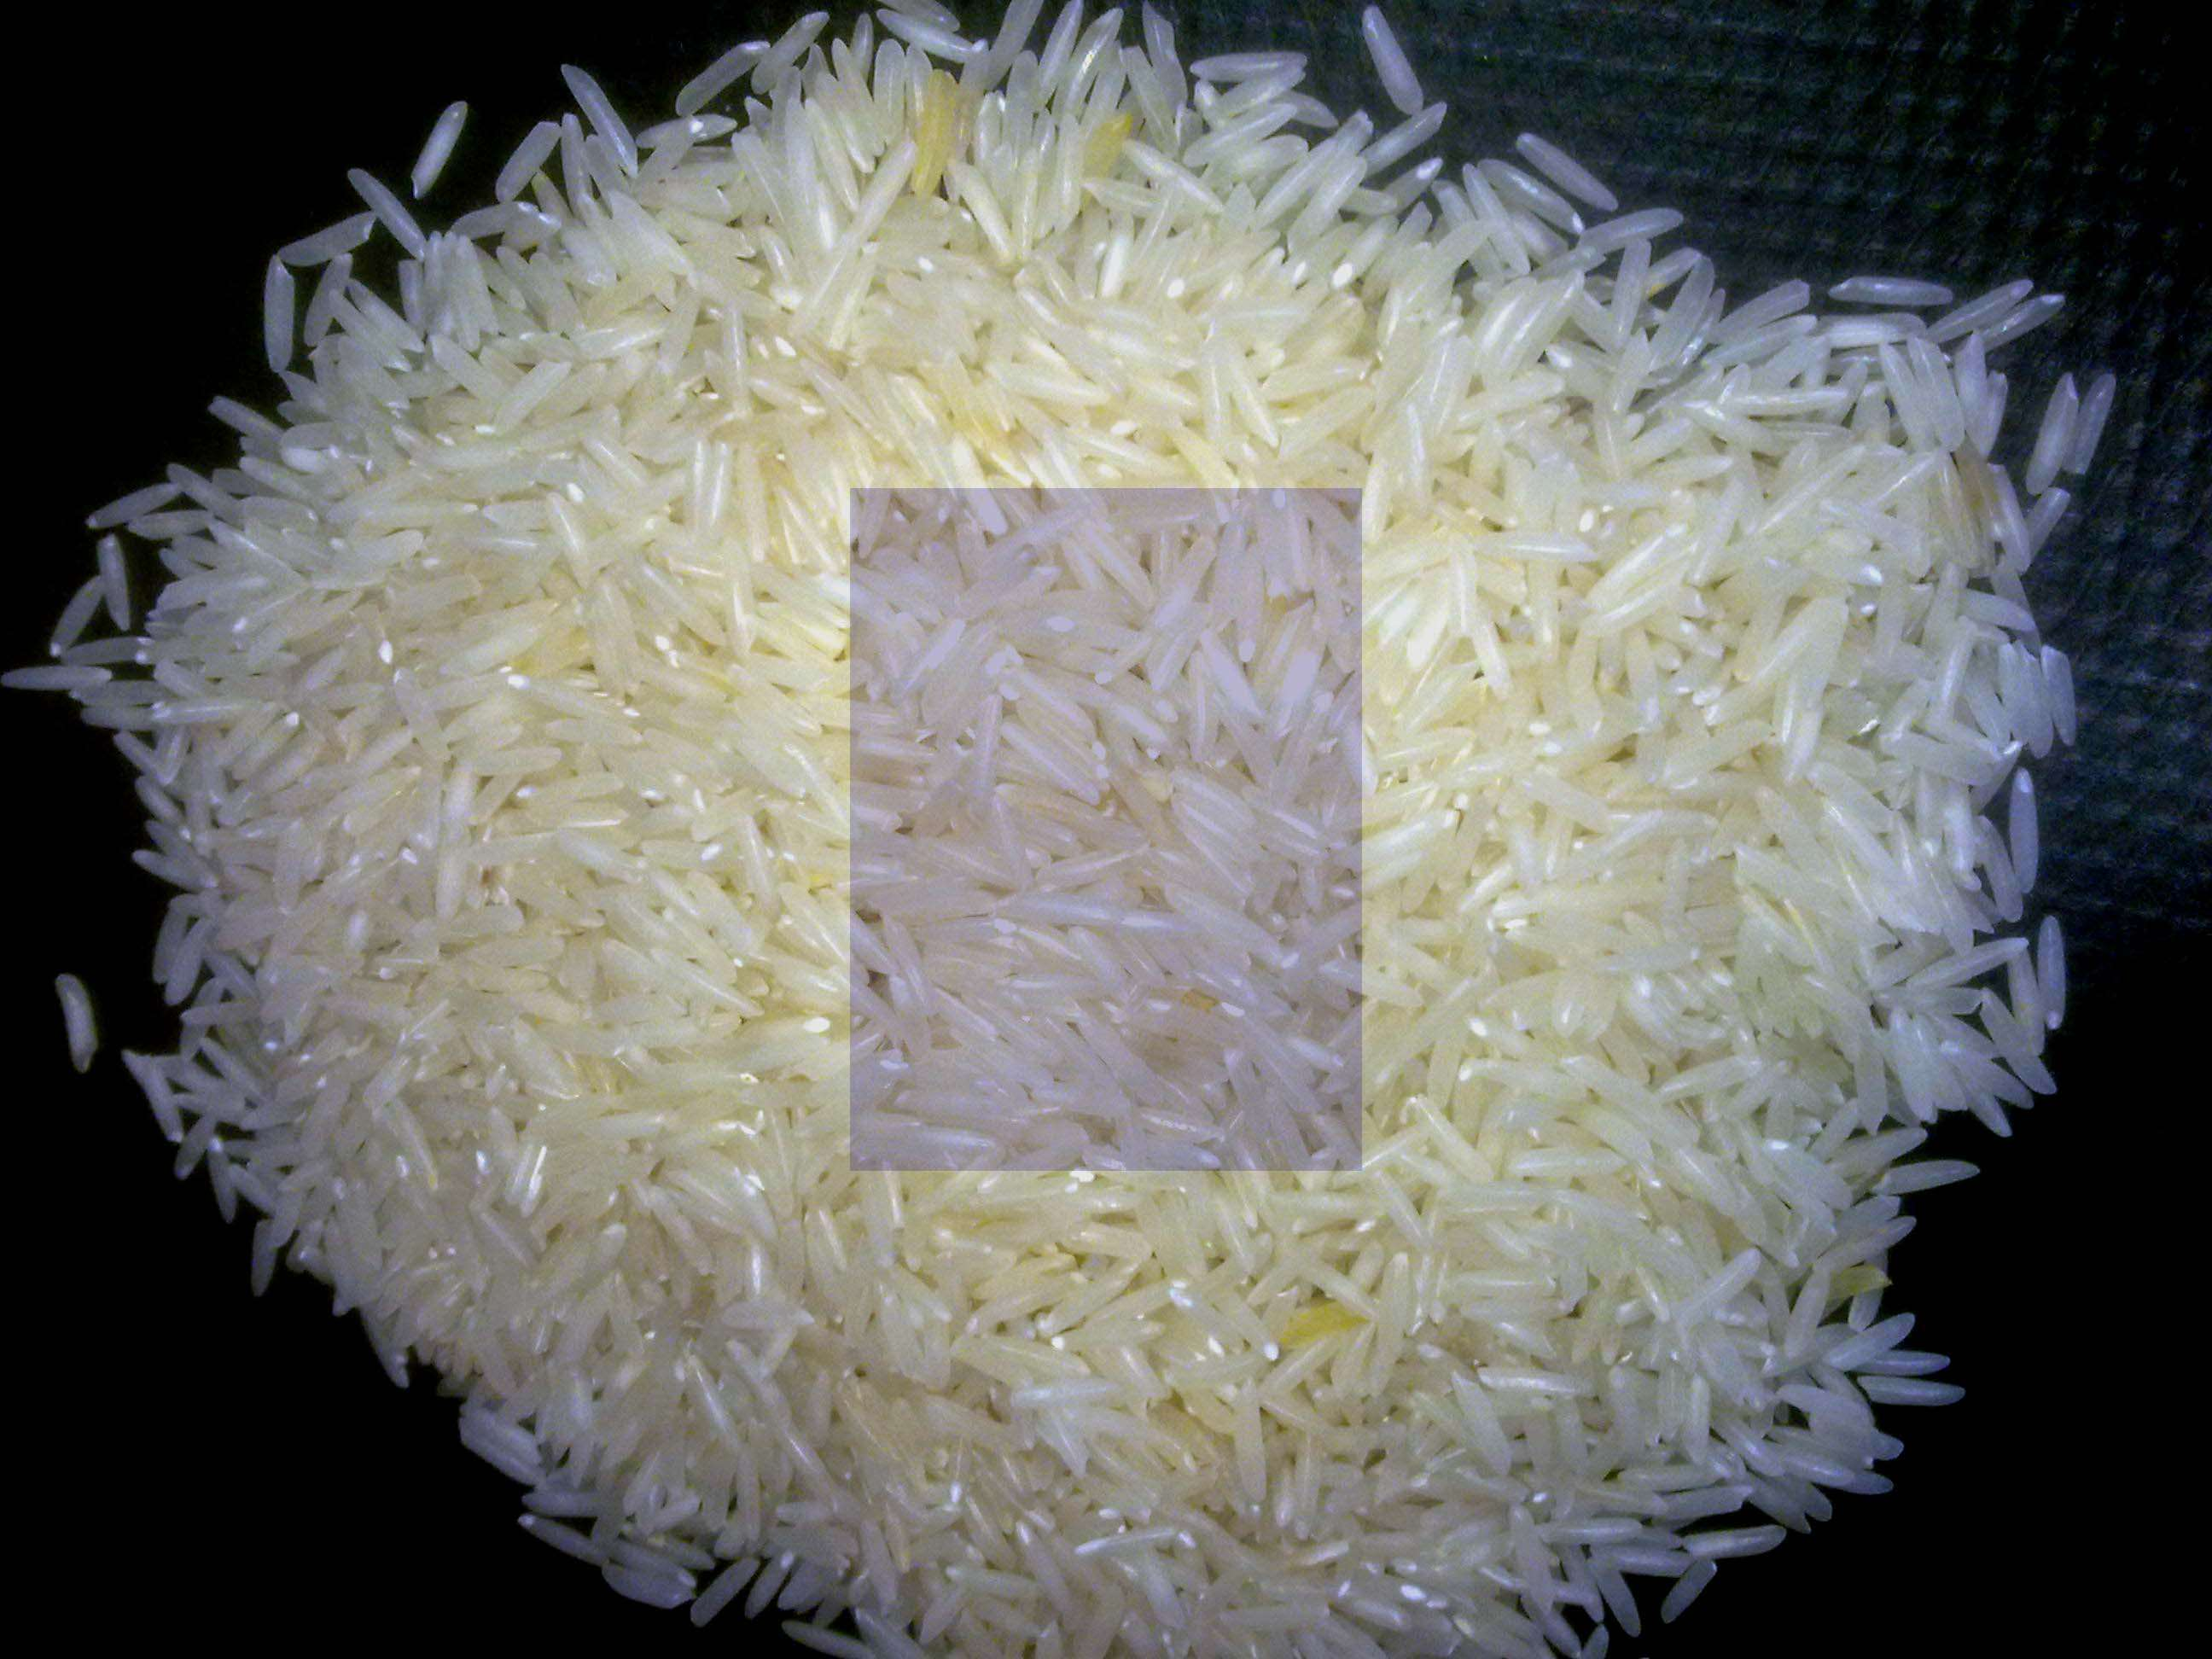 تعبیر خواب برنج , تعبیر خواب برنج پختن , تعبیر خواب برنج خیس شده , تعبیر خواب برنج نذری